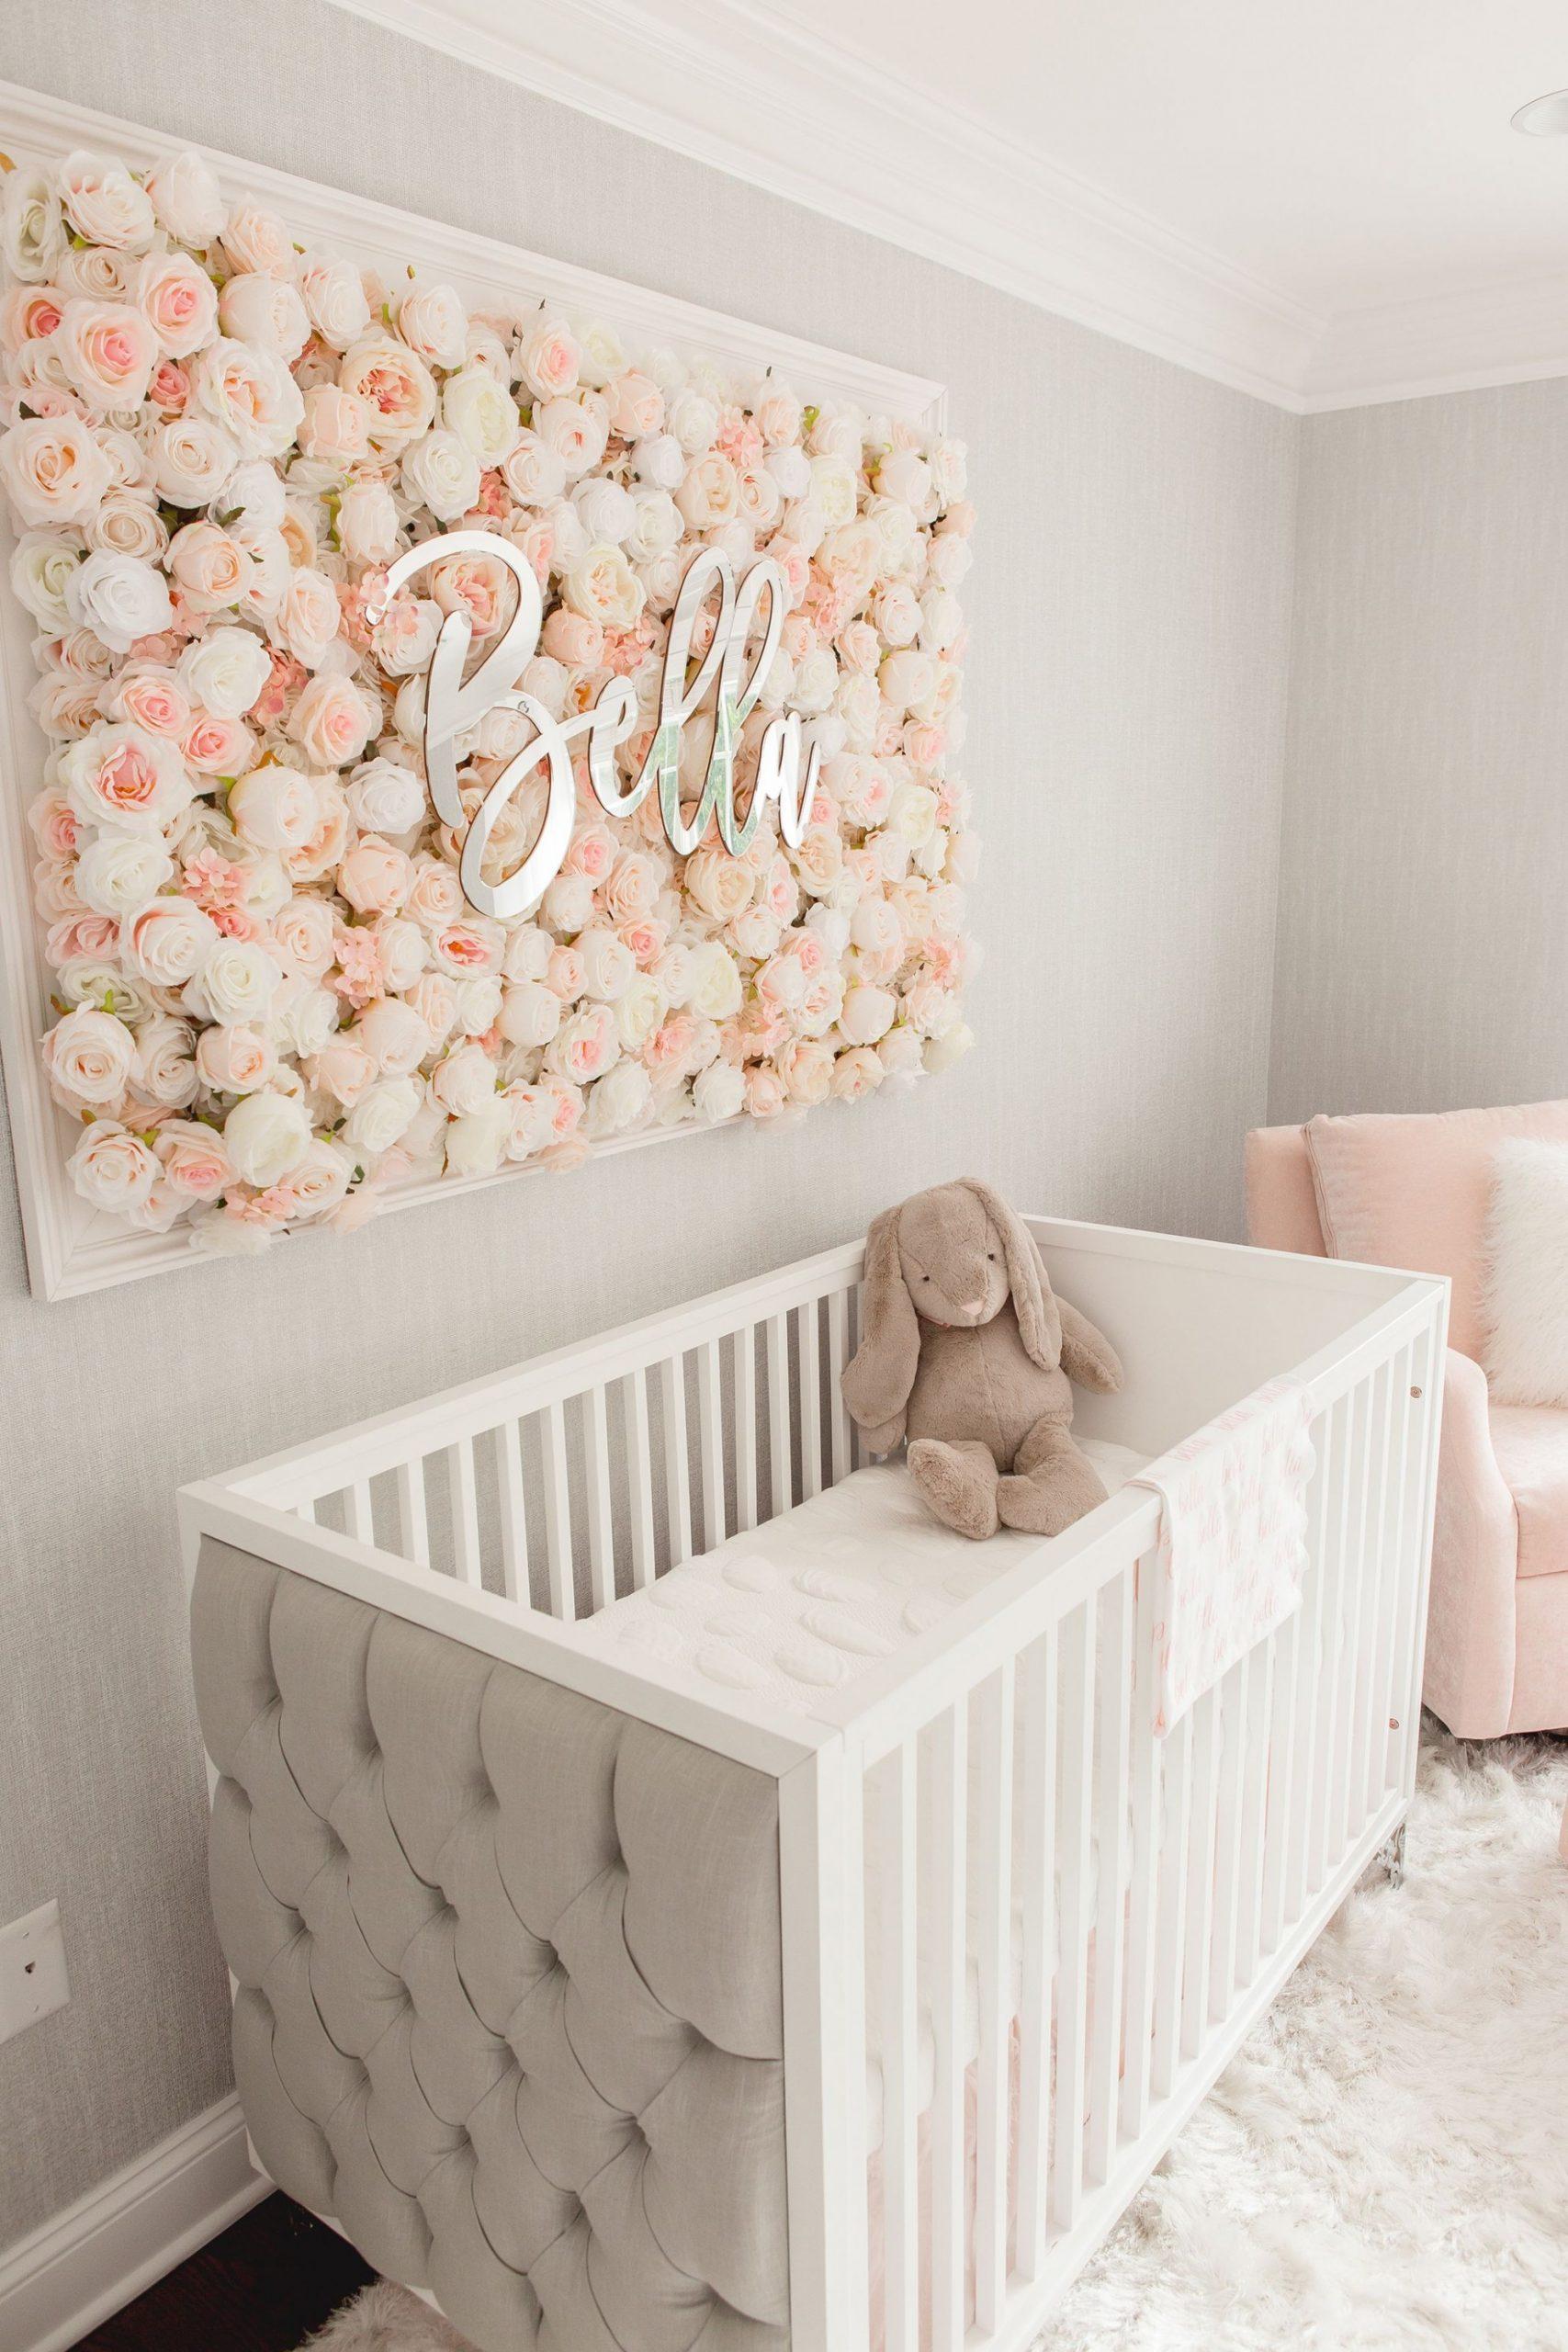 Pin on Baby Girl Nursery Ideas - Baby Room Girl